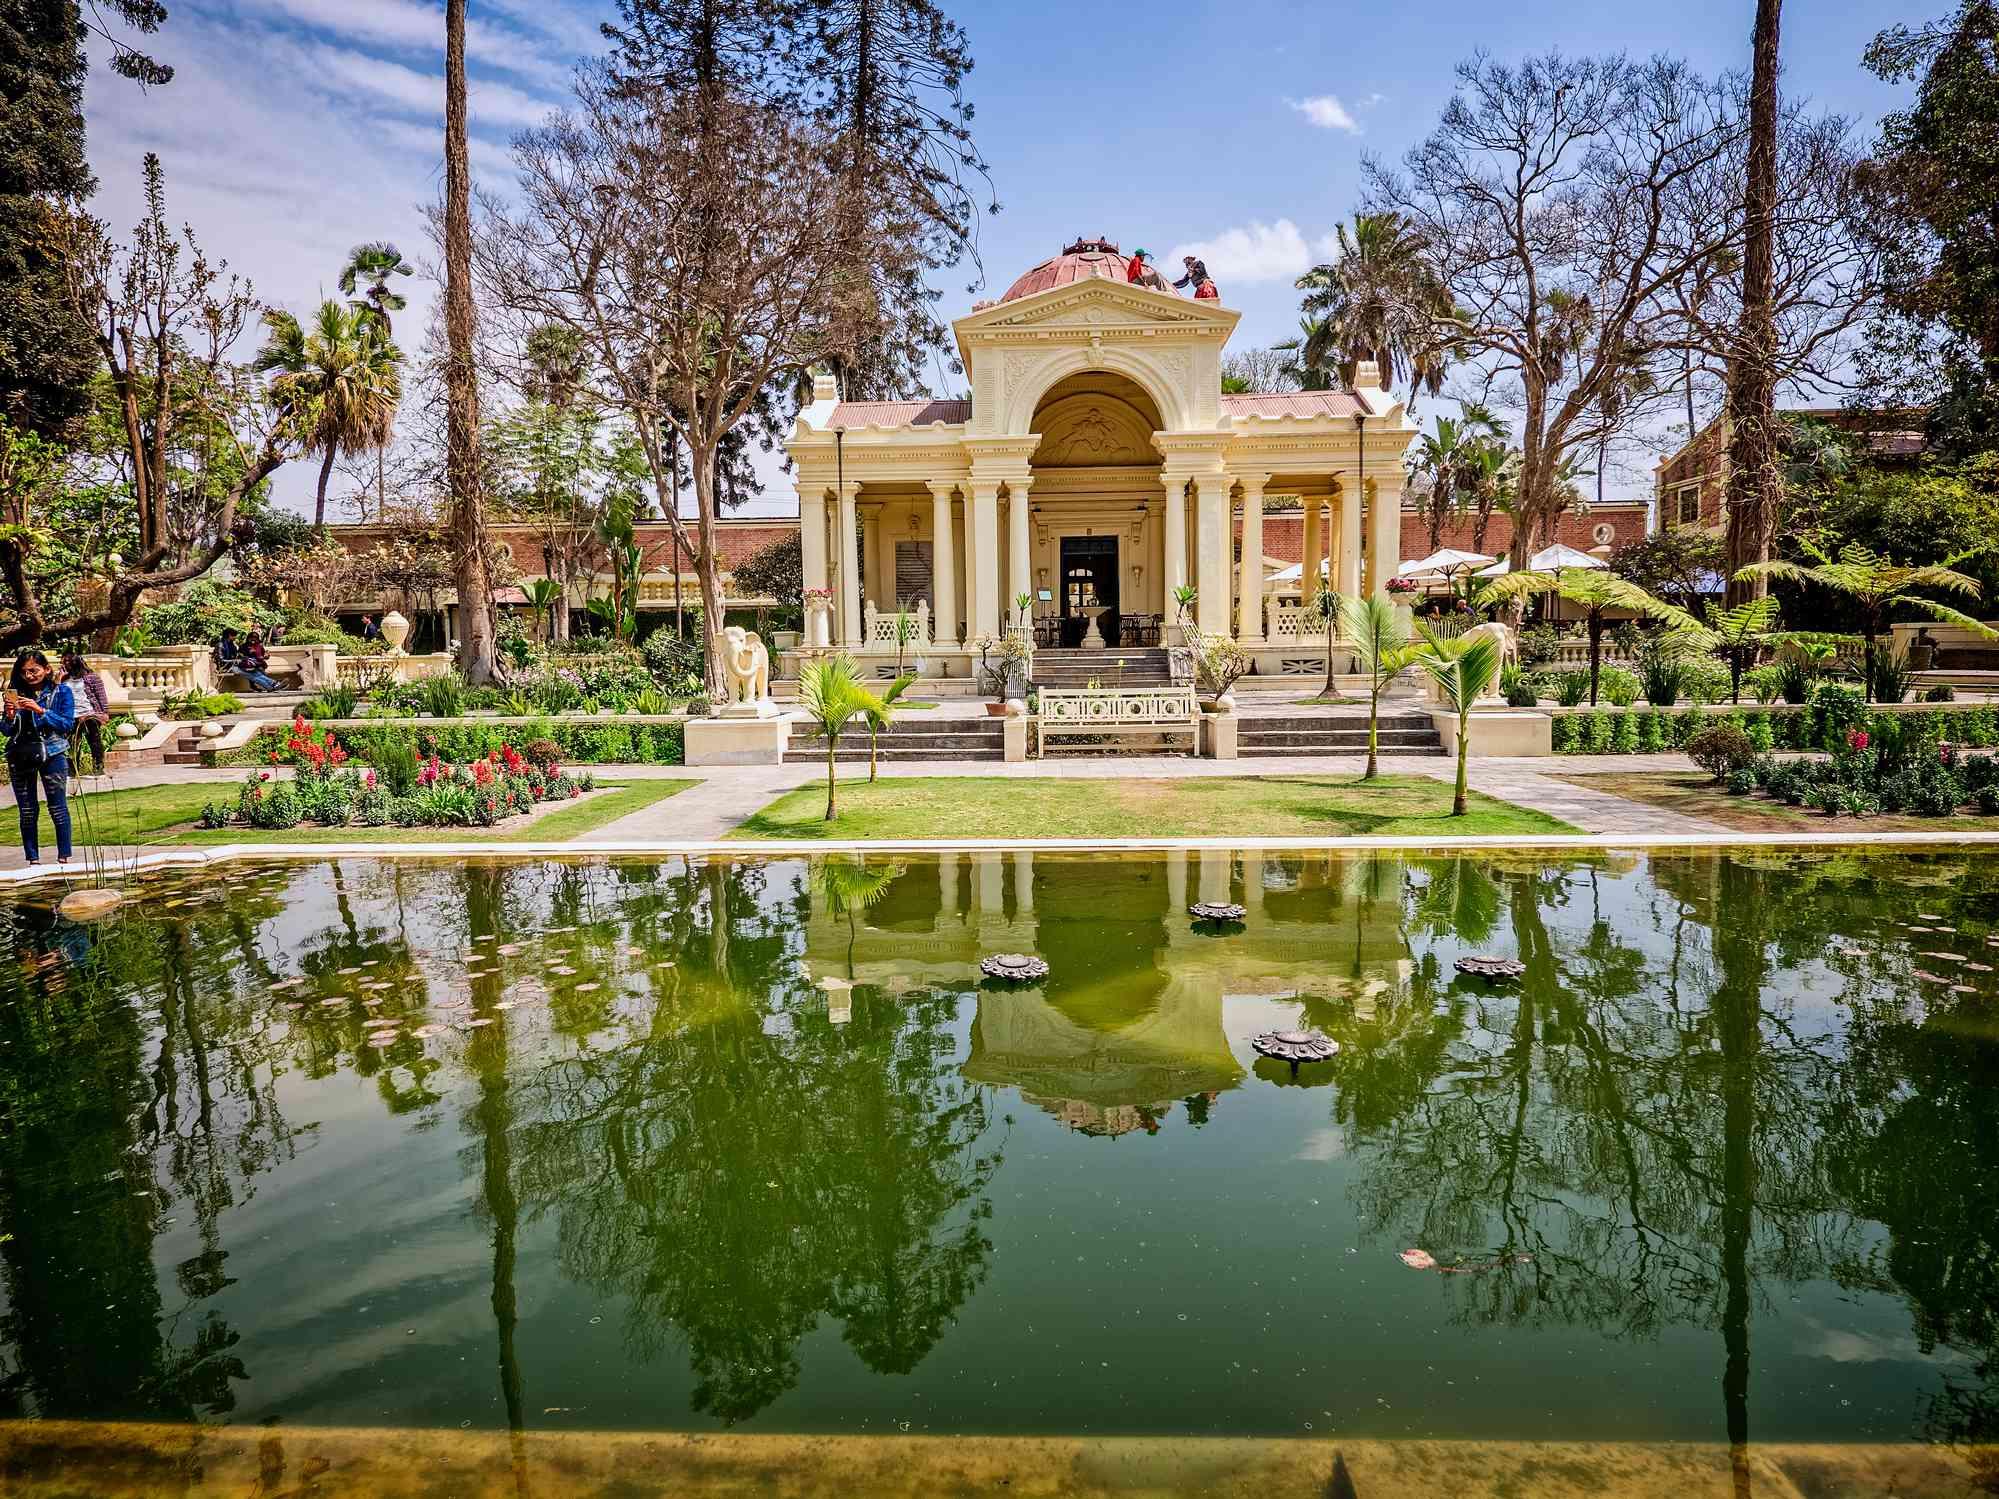 Garden of Dreams, Thamel, Kathmandu, Nepal - March 10, 2017